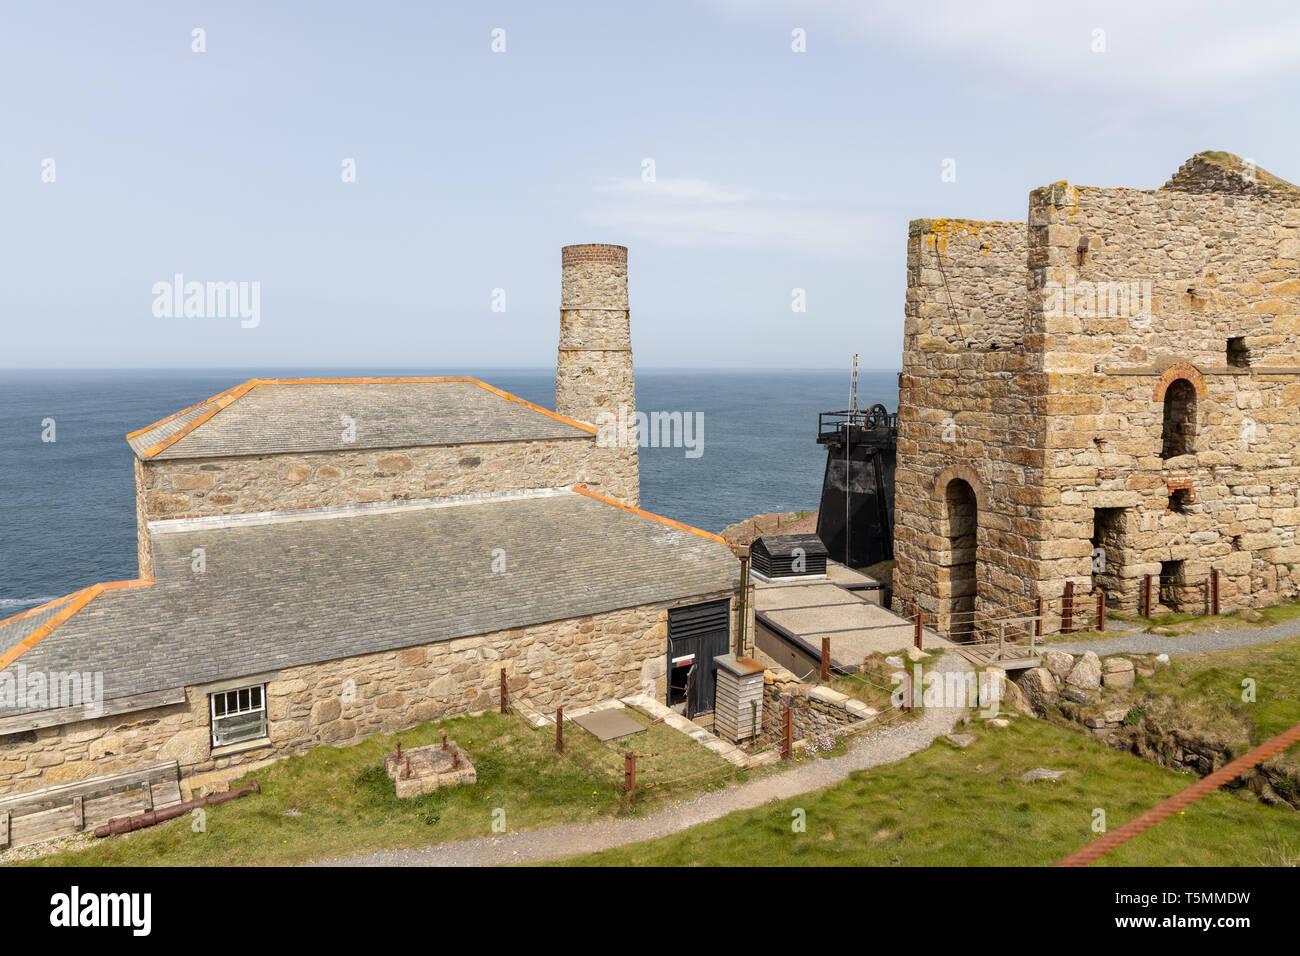 Landscape views of Cornish Tin mines - Levant Mine and Beam